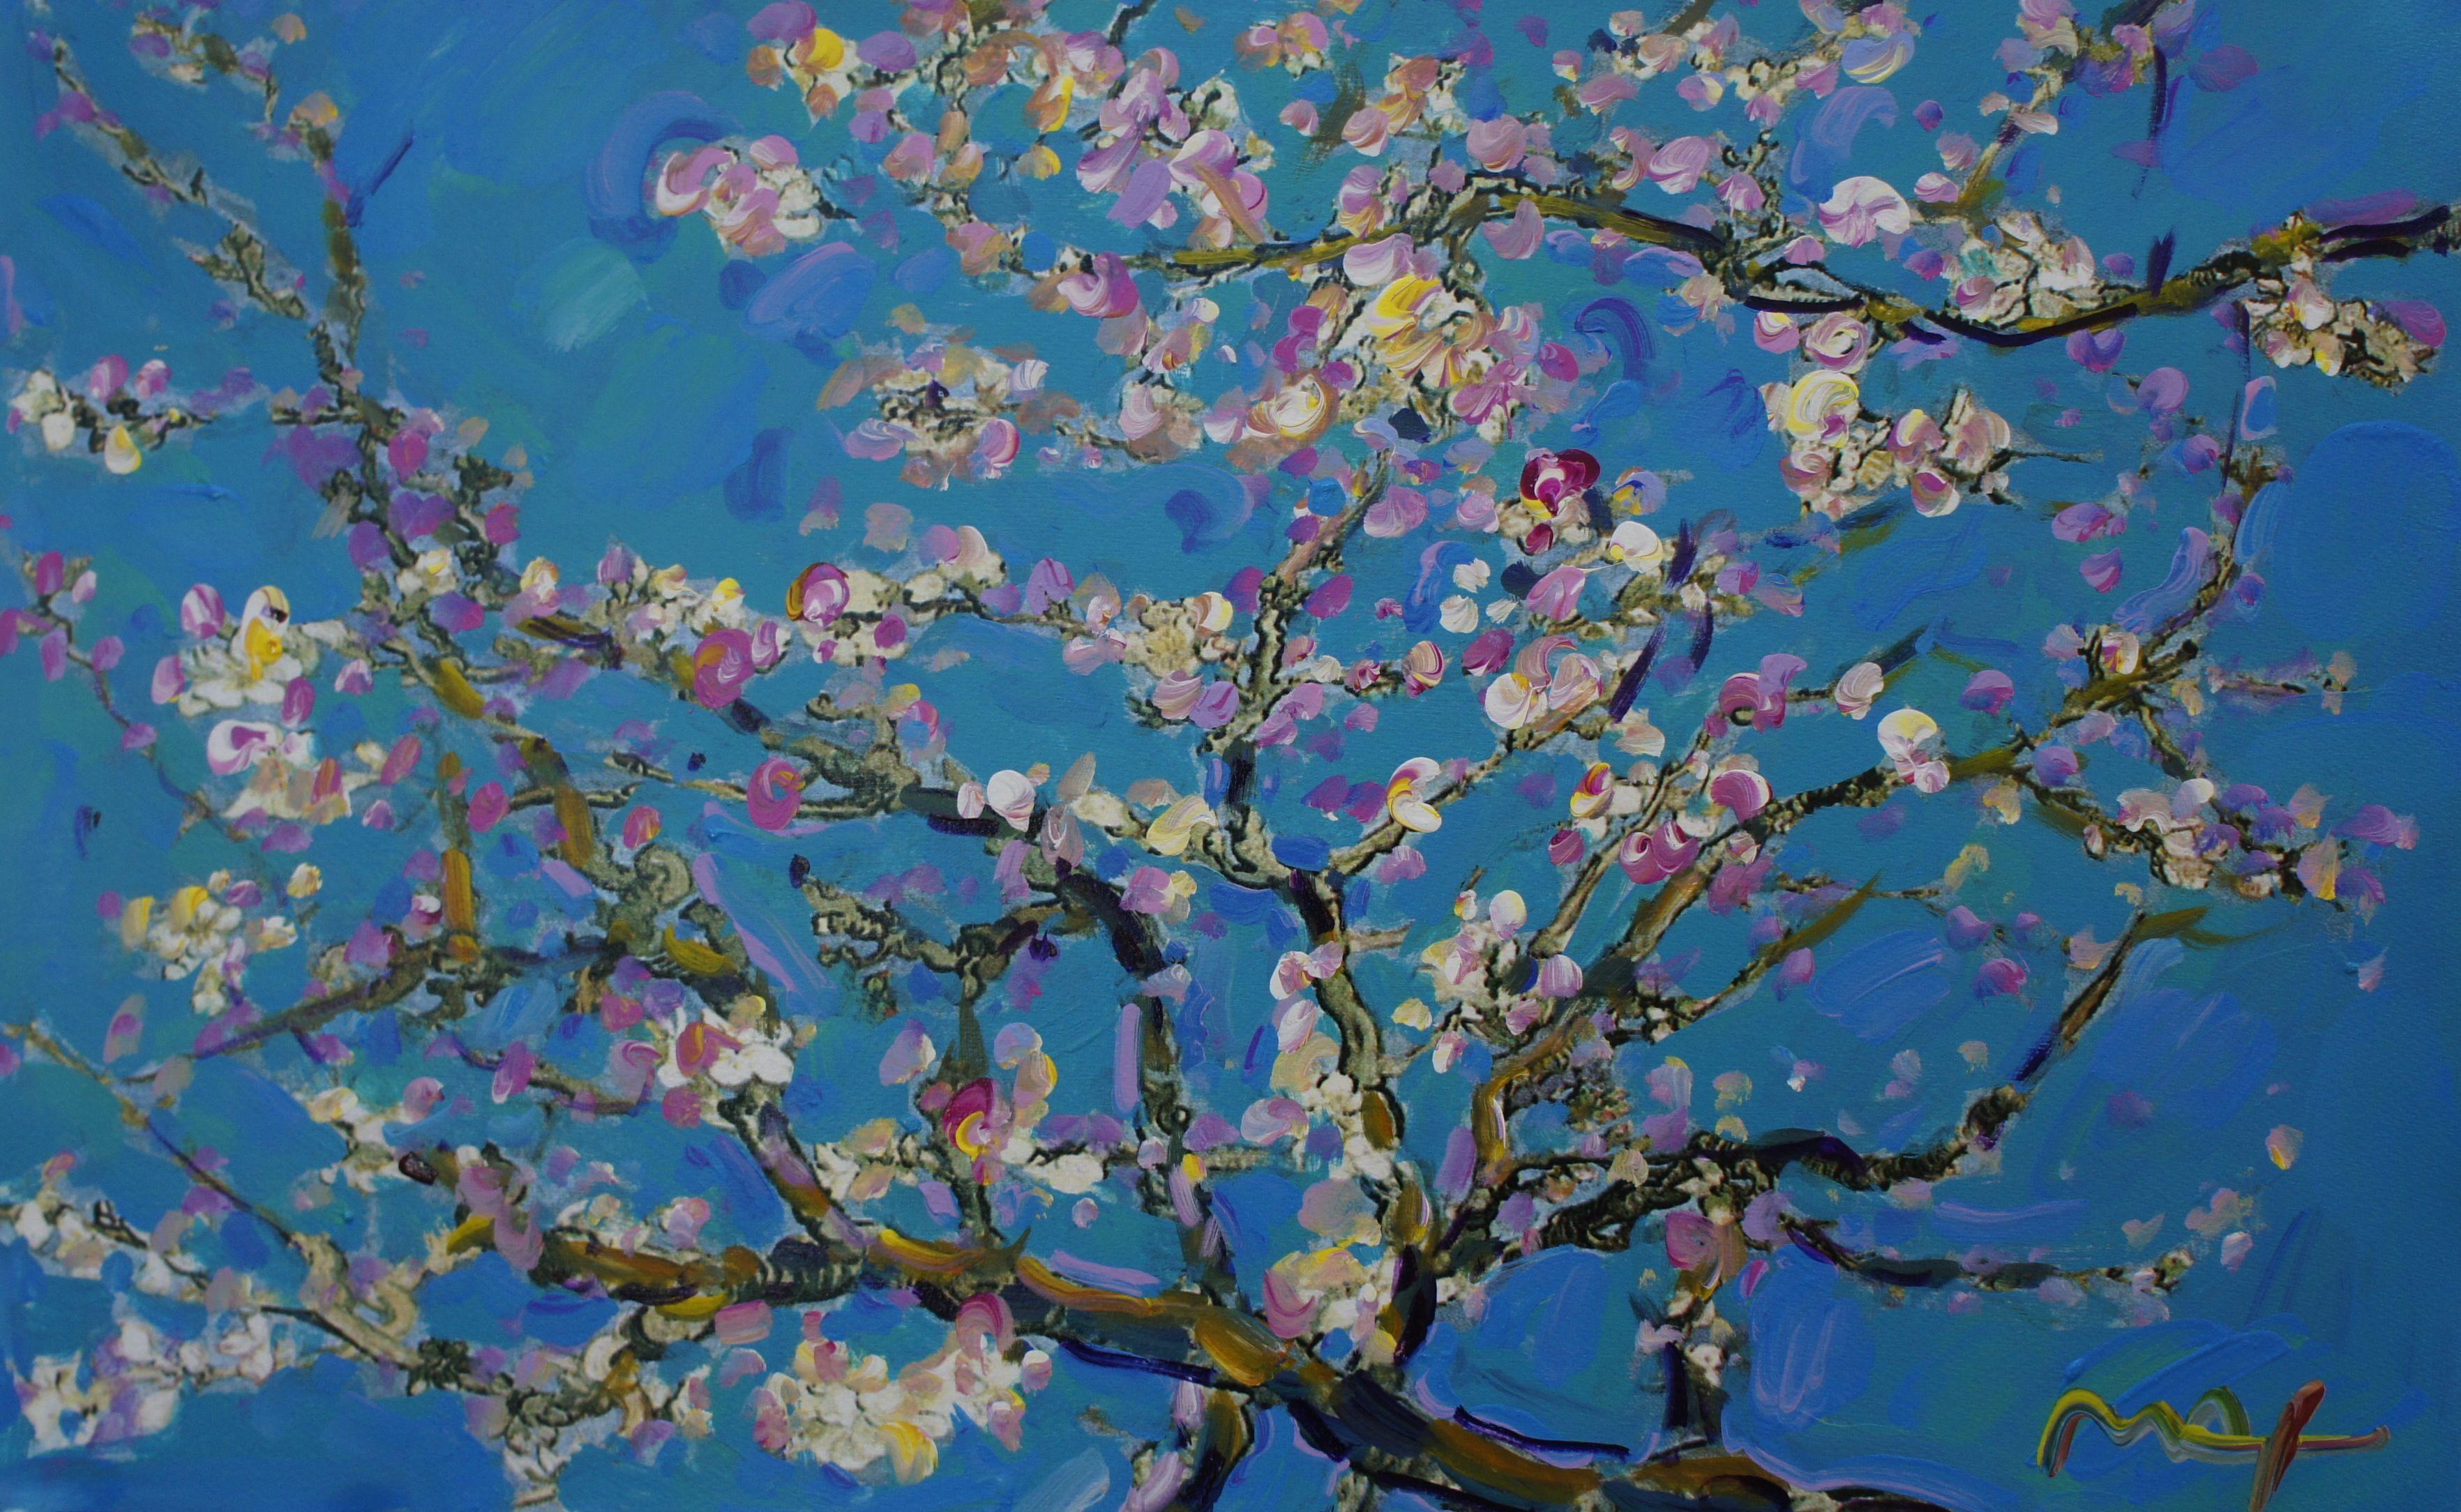 homage to van gogh almond blossom ver i 1 peter max 16 x 25 7 mixed media on paper j. Black Bedroom Furniture Sets. Home Design Ideas